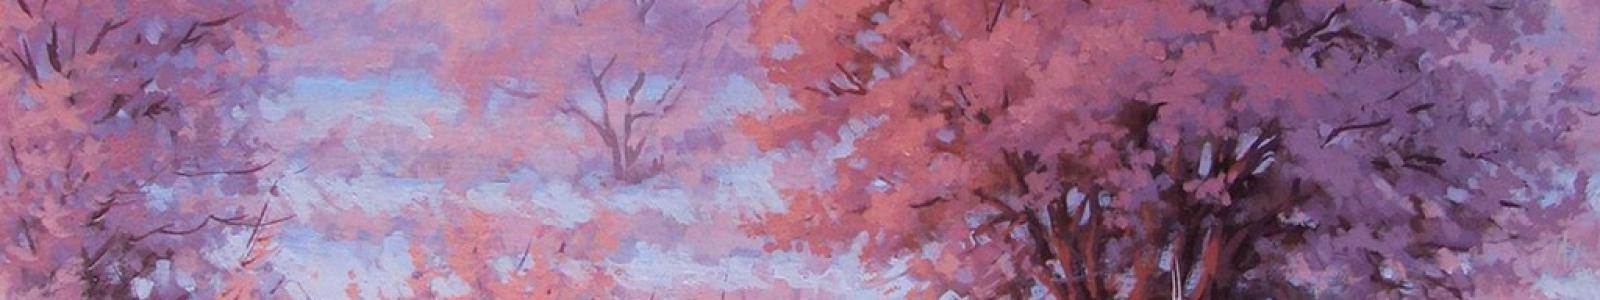 Galerie Bildmaler Karyna Alexandrova